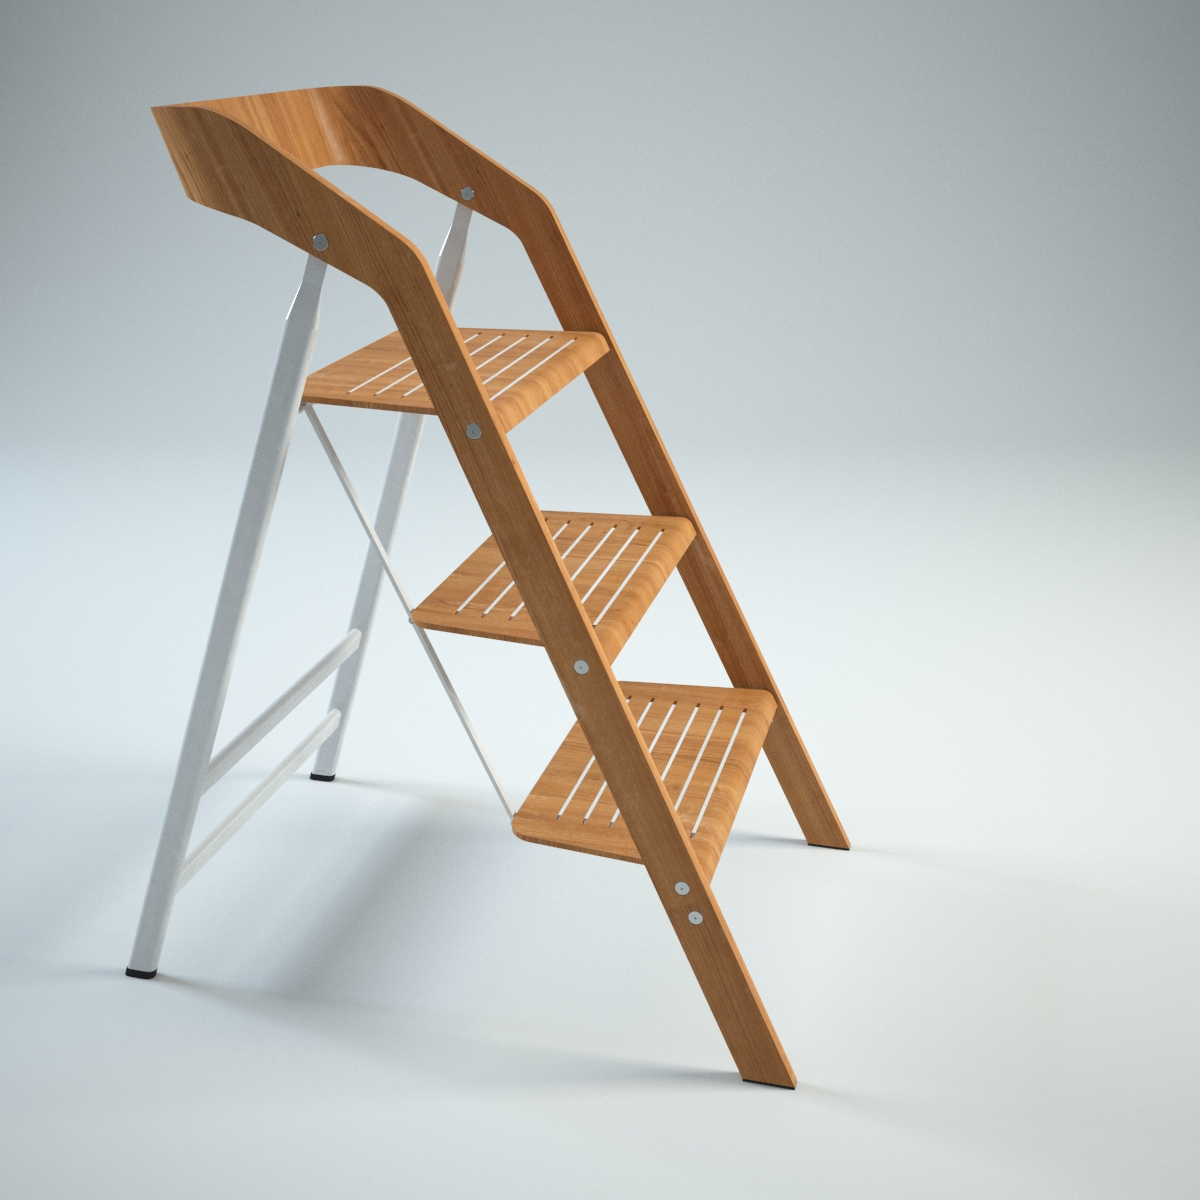 Vintage Usit Stepladder Chair 3 Step Version Model Max 7